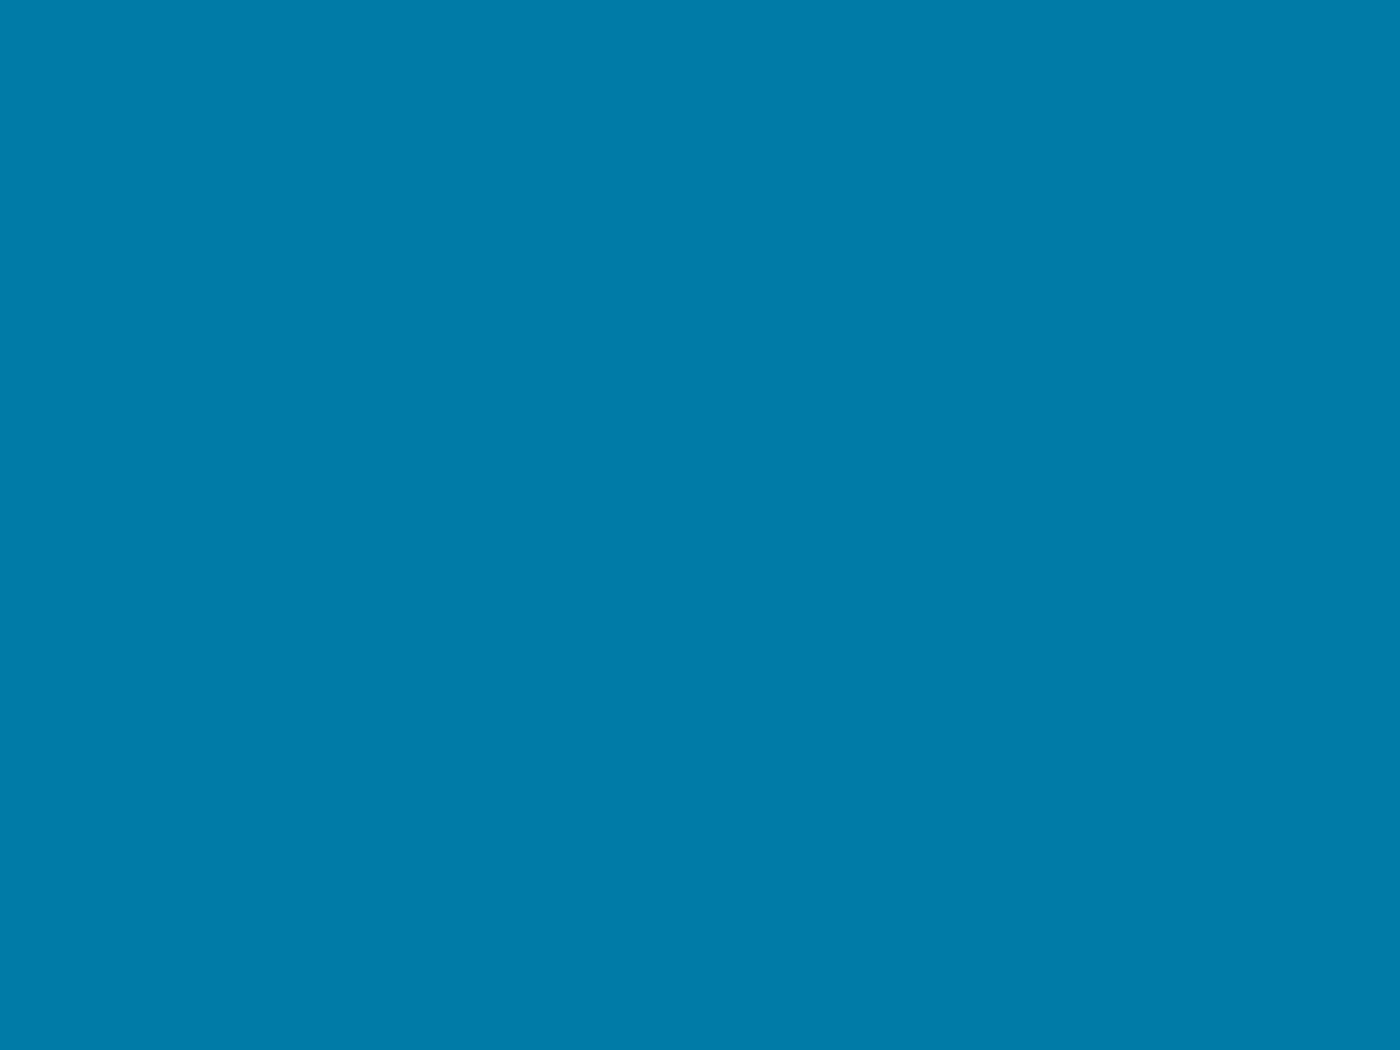 1400x1050 Celadon Blue Solid Color Background